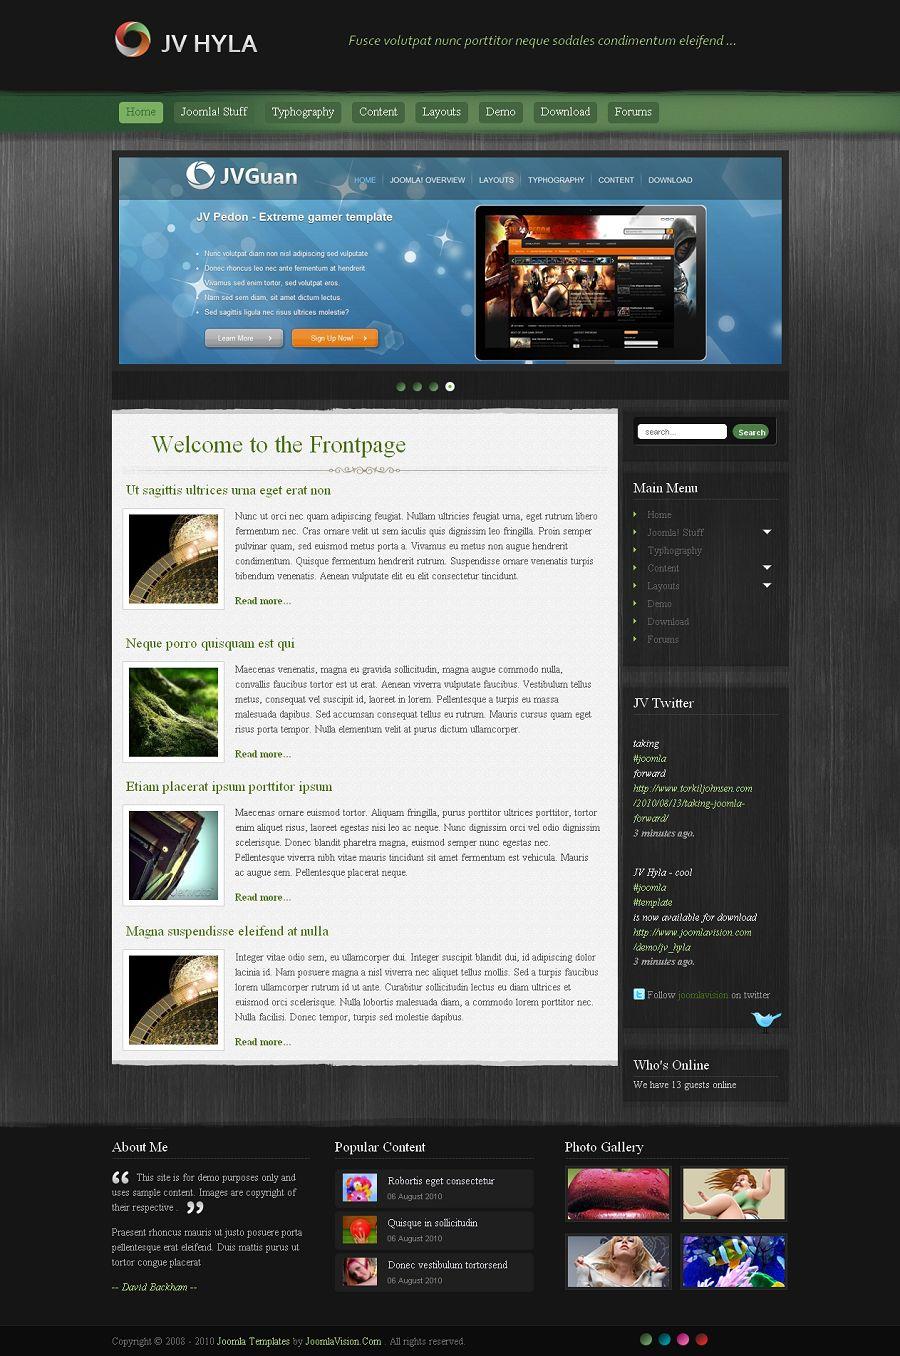 JV Hyla Premium Joomla Blog Template, Joomla Blogging Theme